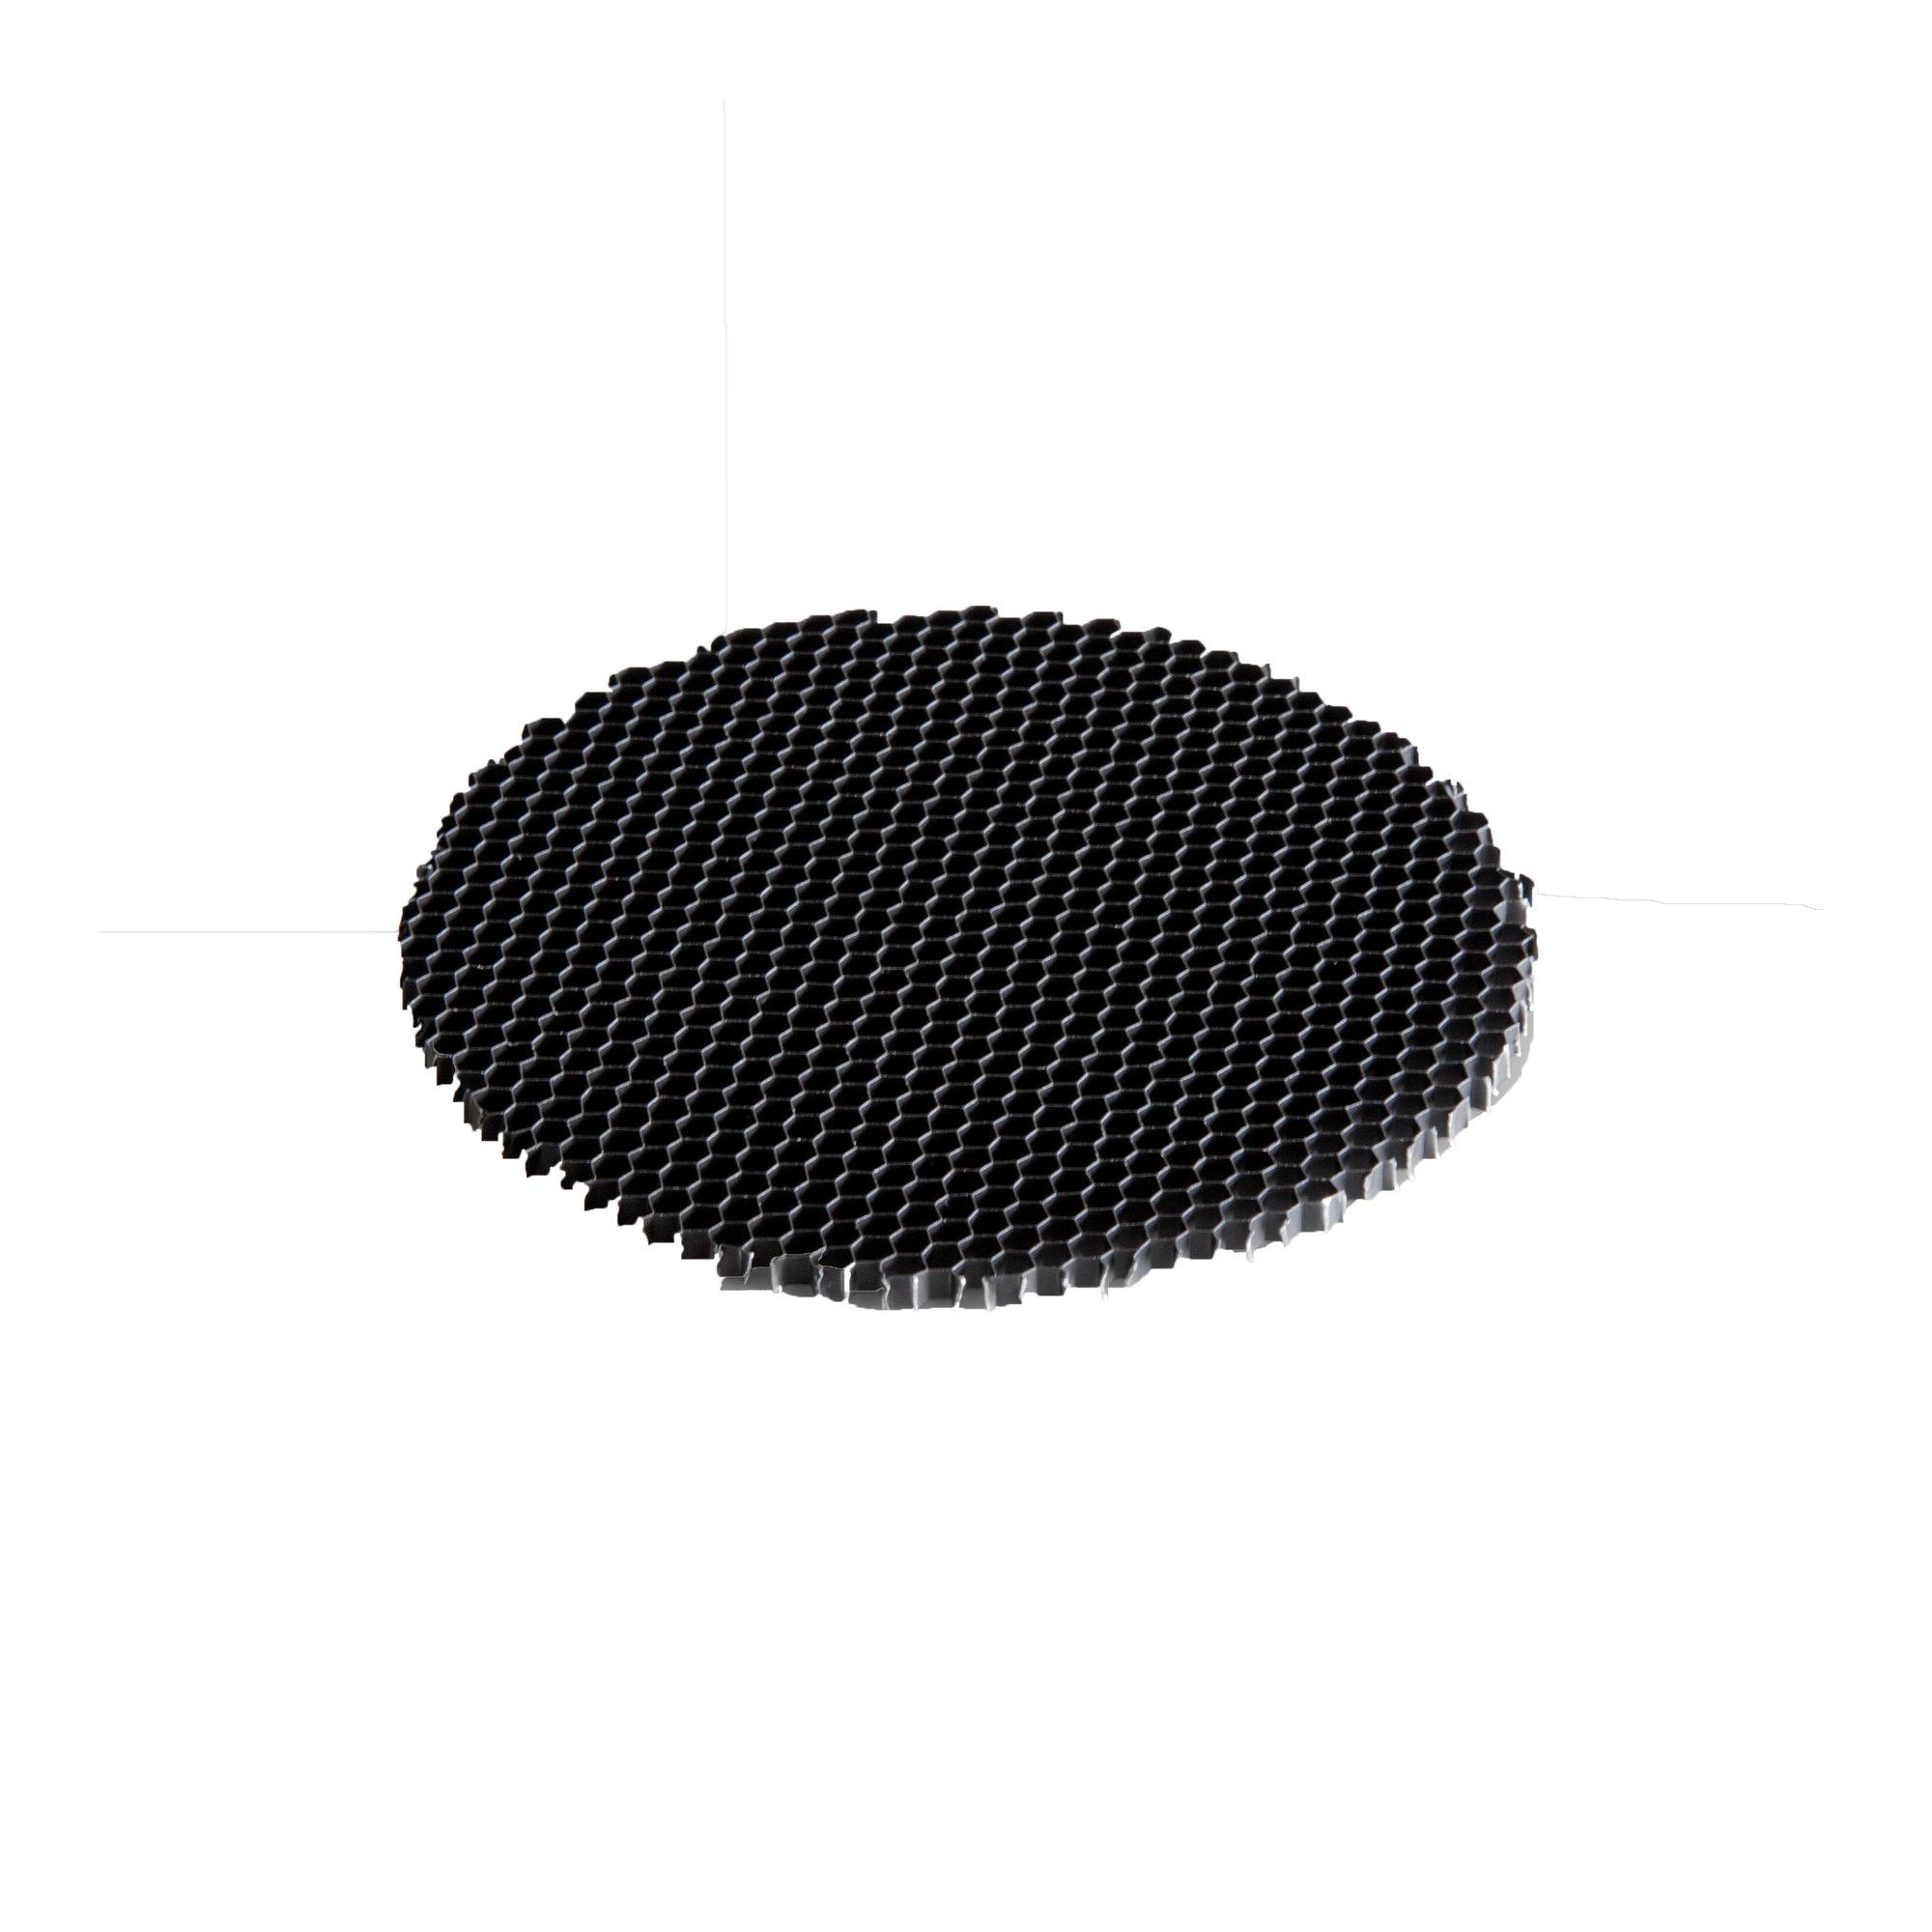 Vorsa 50 Honeycomb Insert Ø51.5mm